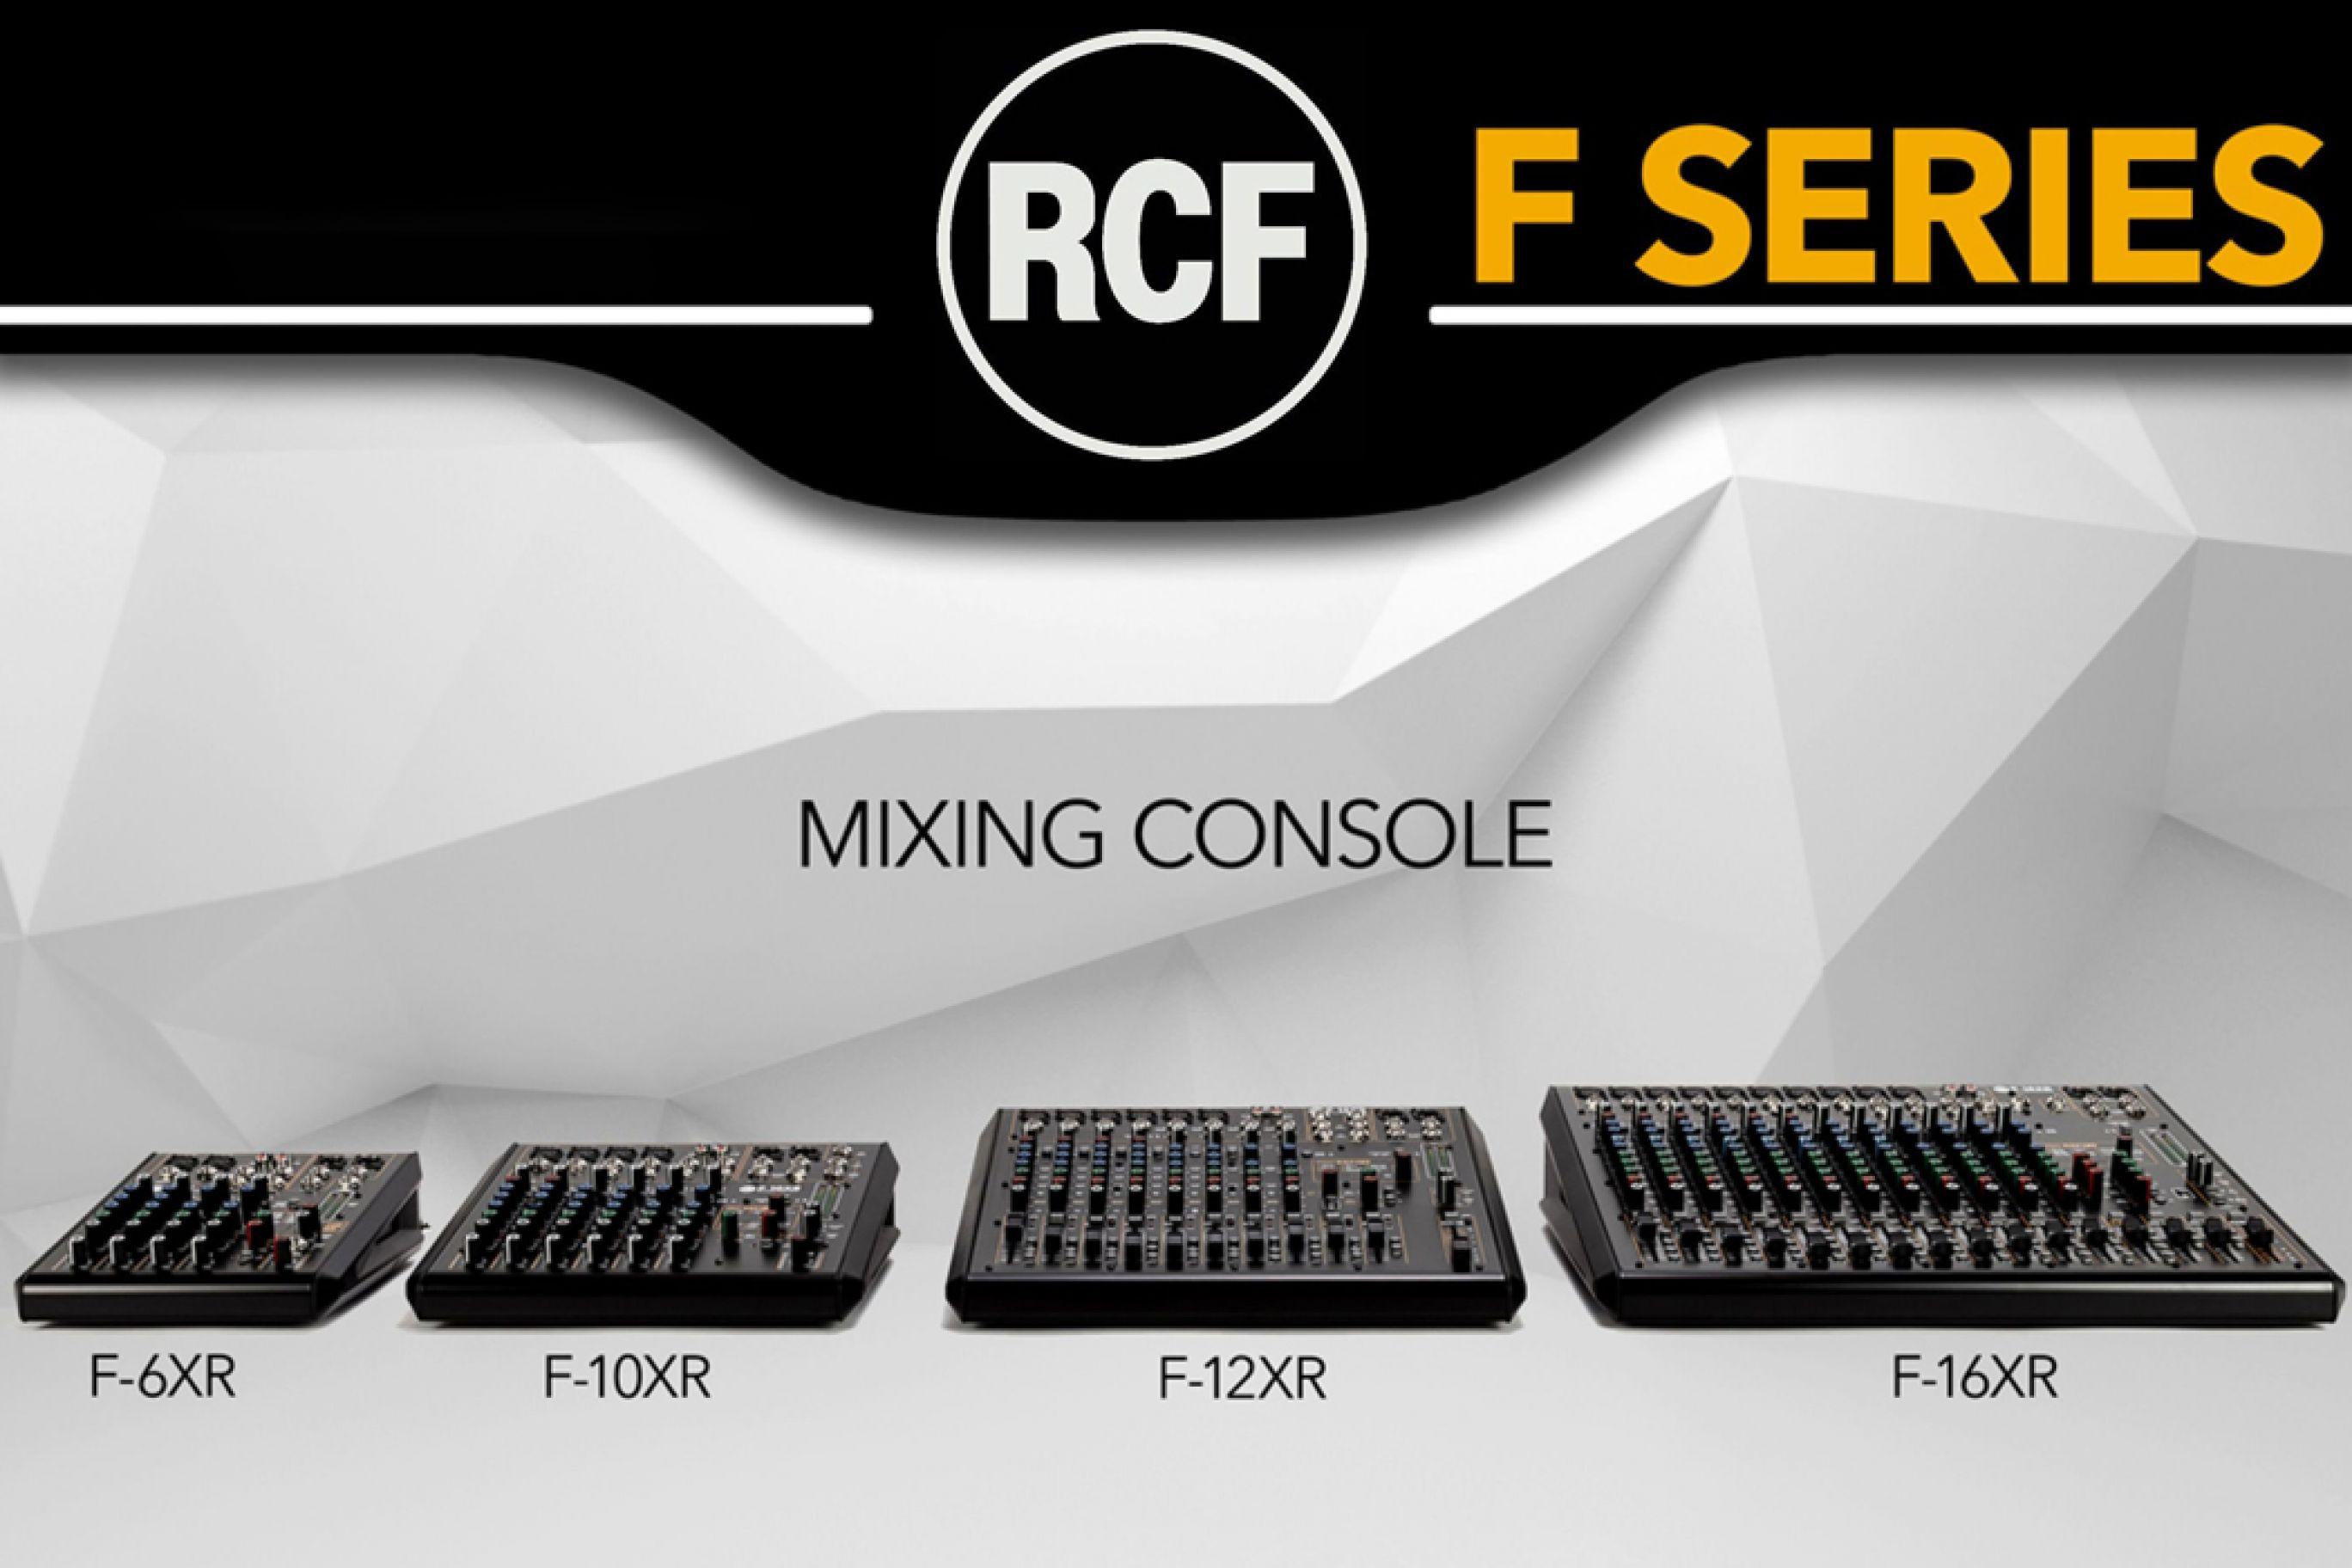 Nuovi Mixer RCF F Series